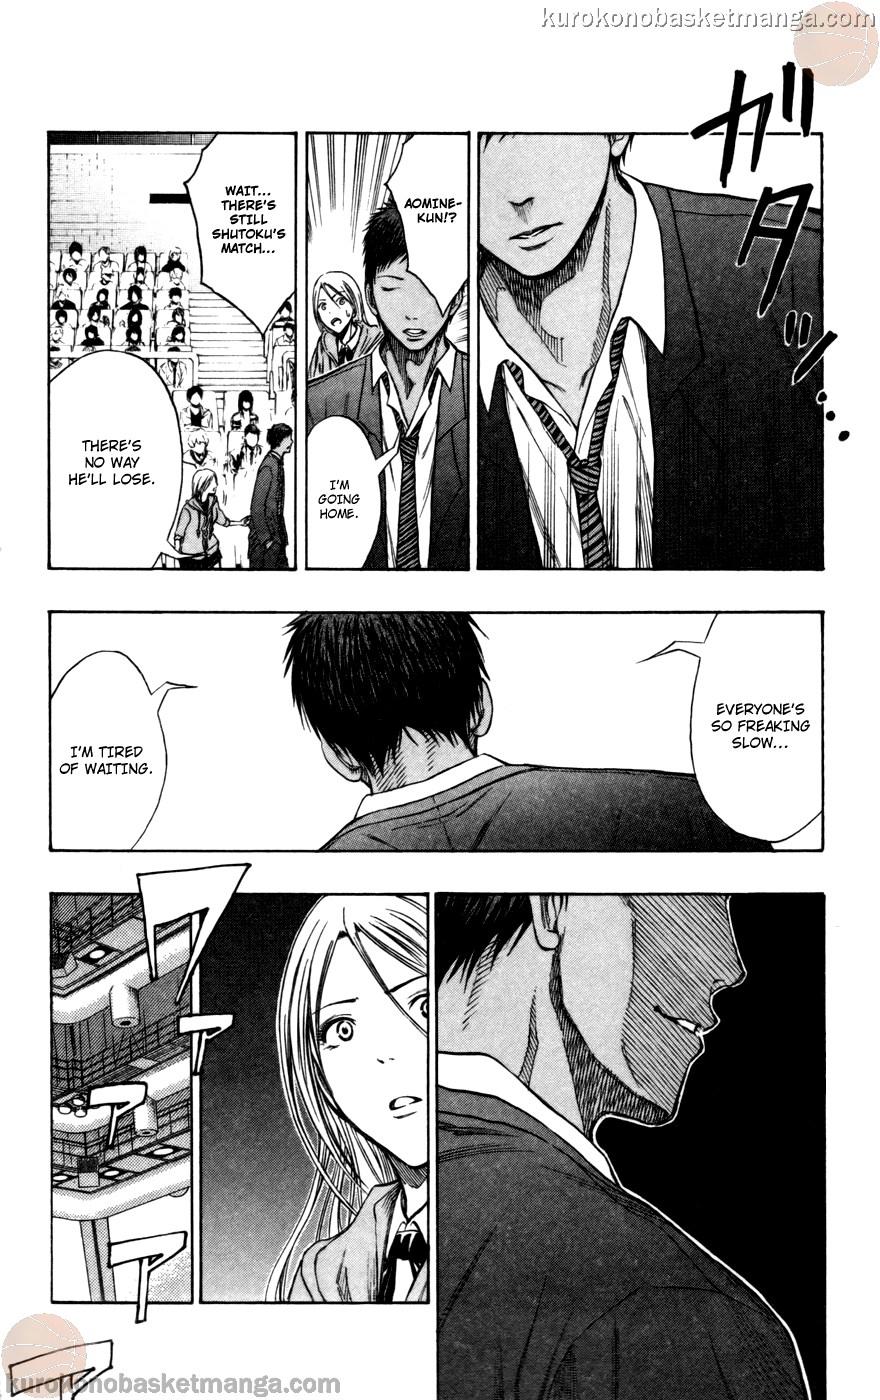 Kuroko no Basket Manga Chapter 108 - Image 08